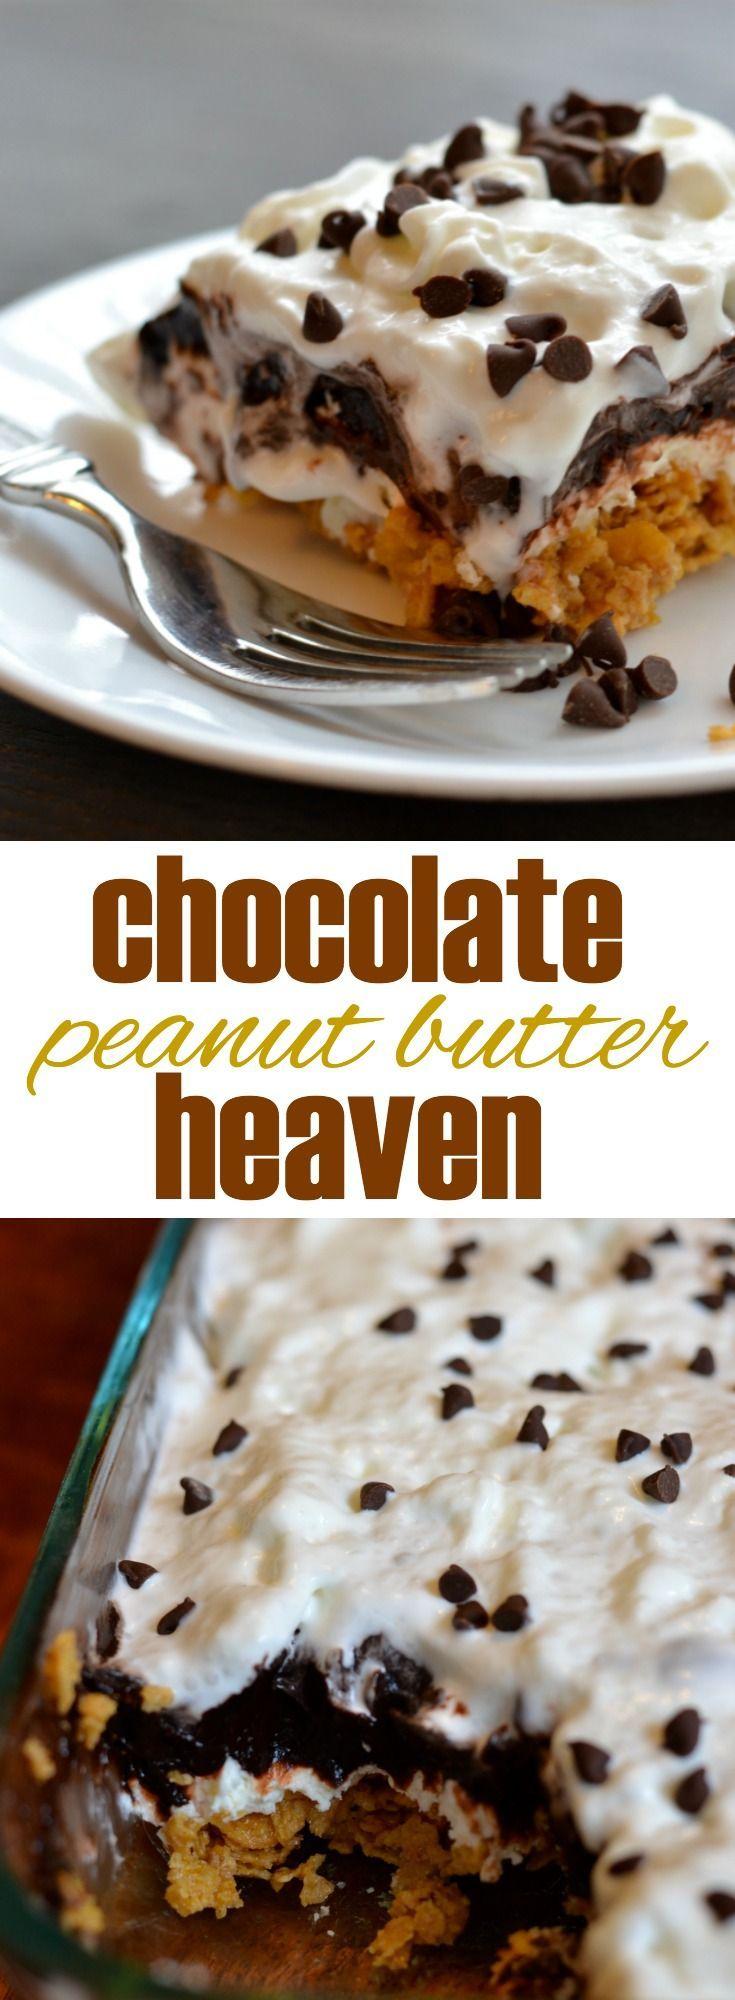 Chocolate Peanut Butter Heaven Easy No Bake Dessert Mini Chocolate Chipschocolate Puddingchocolate